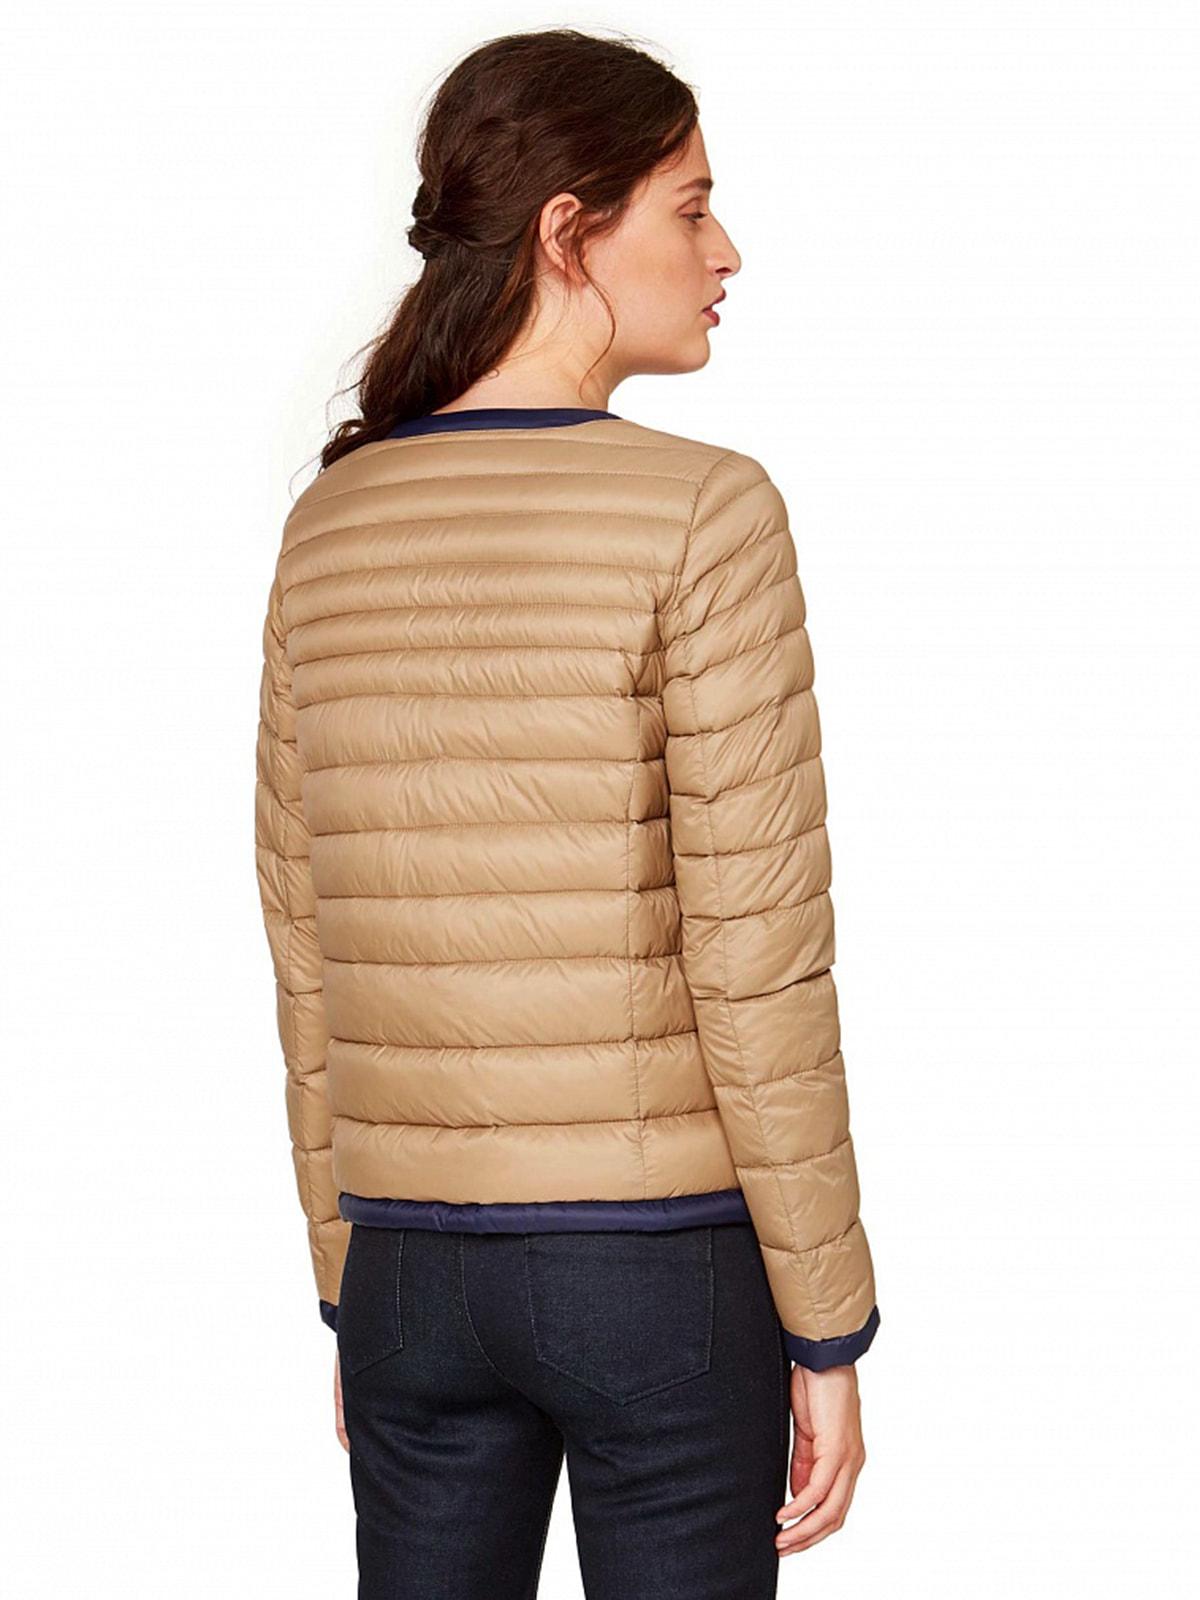 Куртка бежевая | 3556438 | фото 11